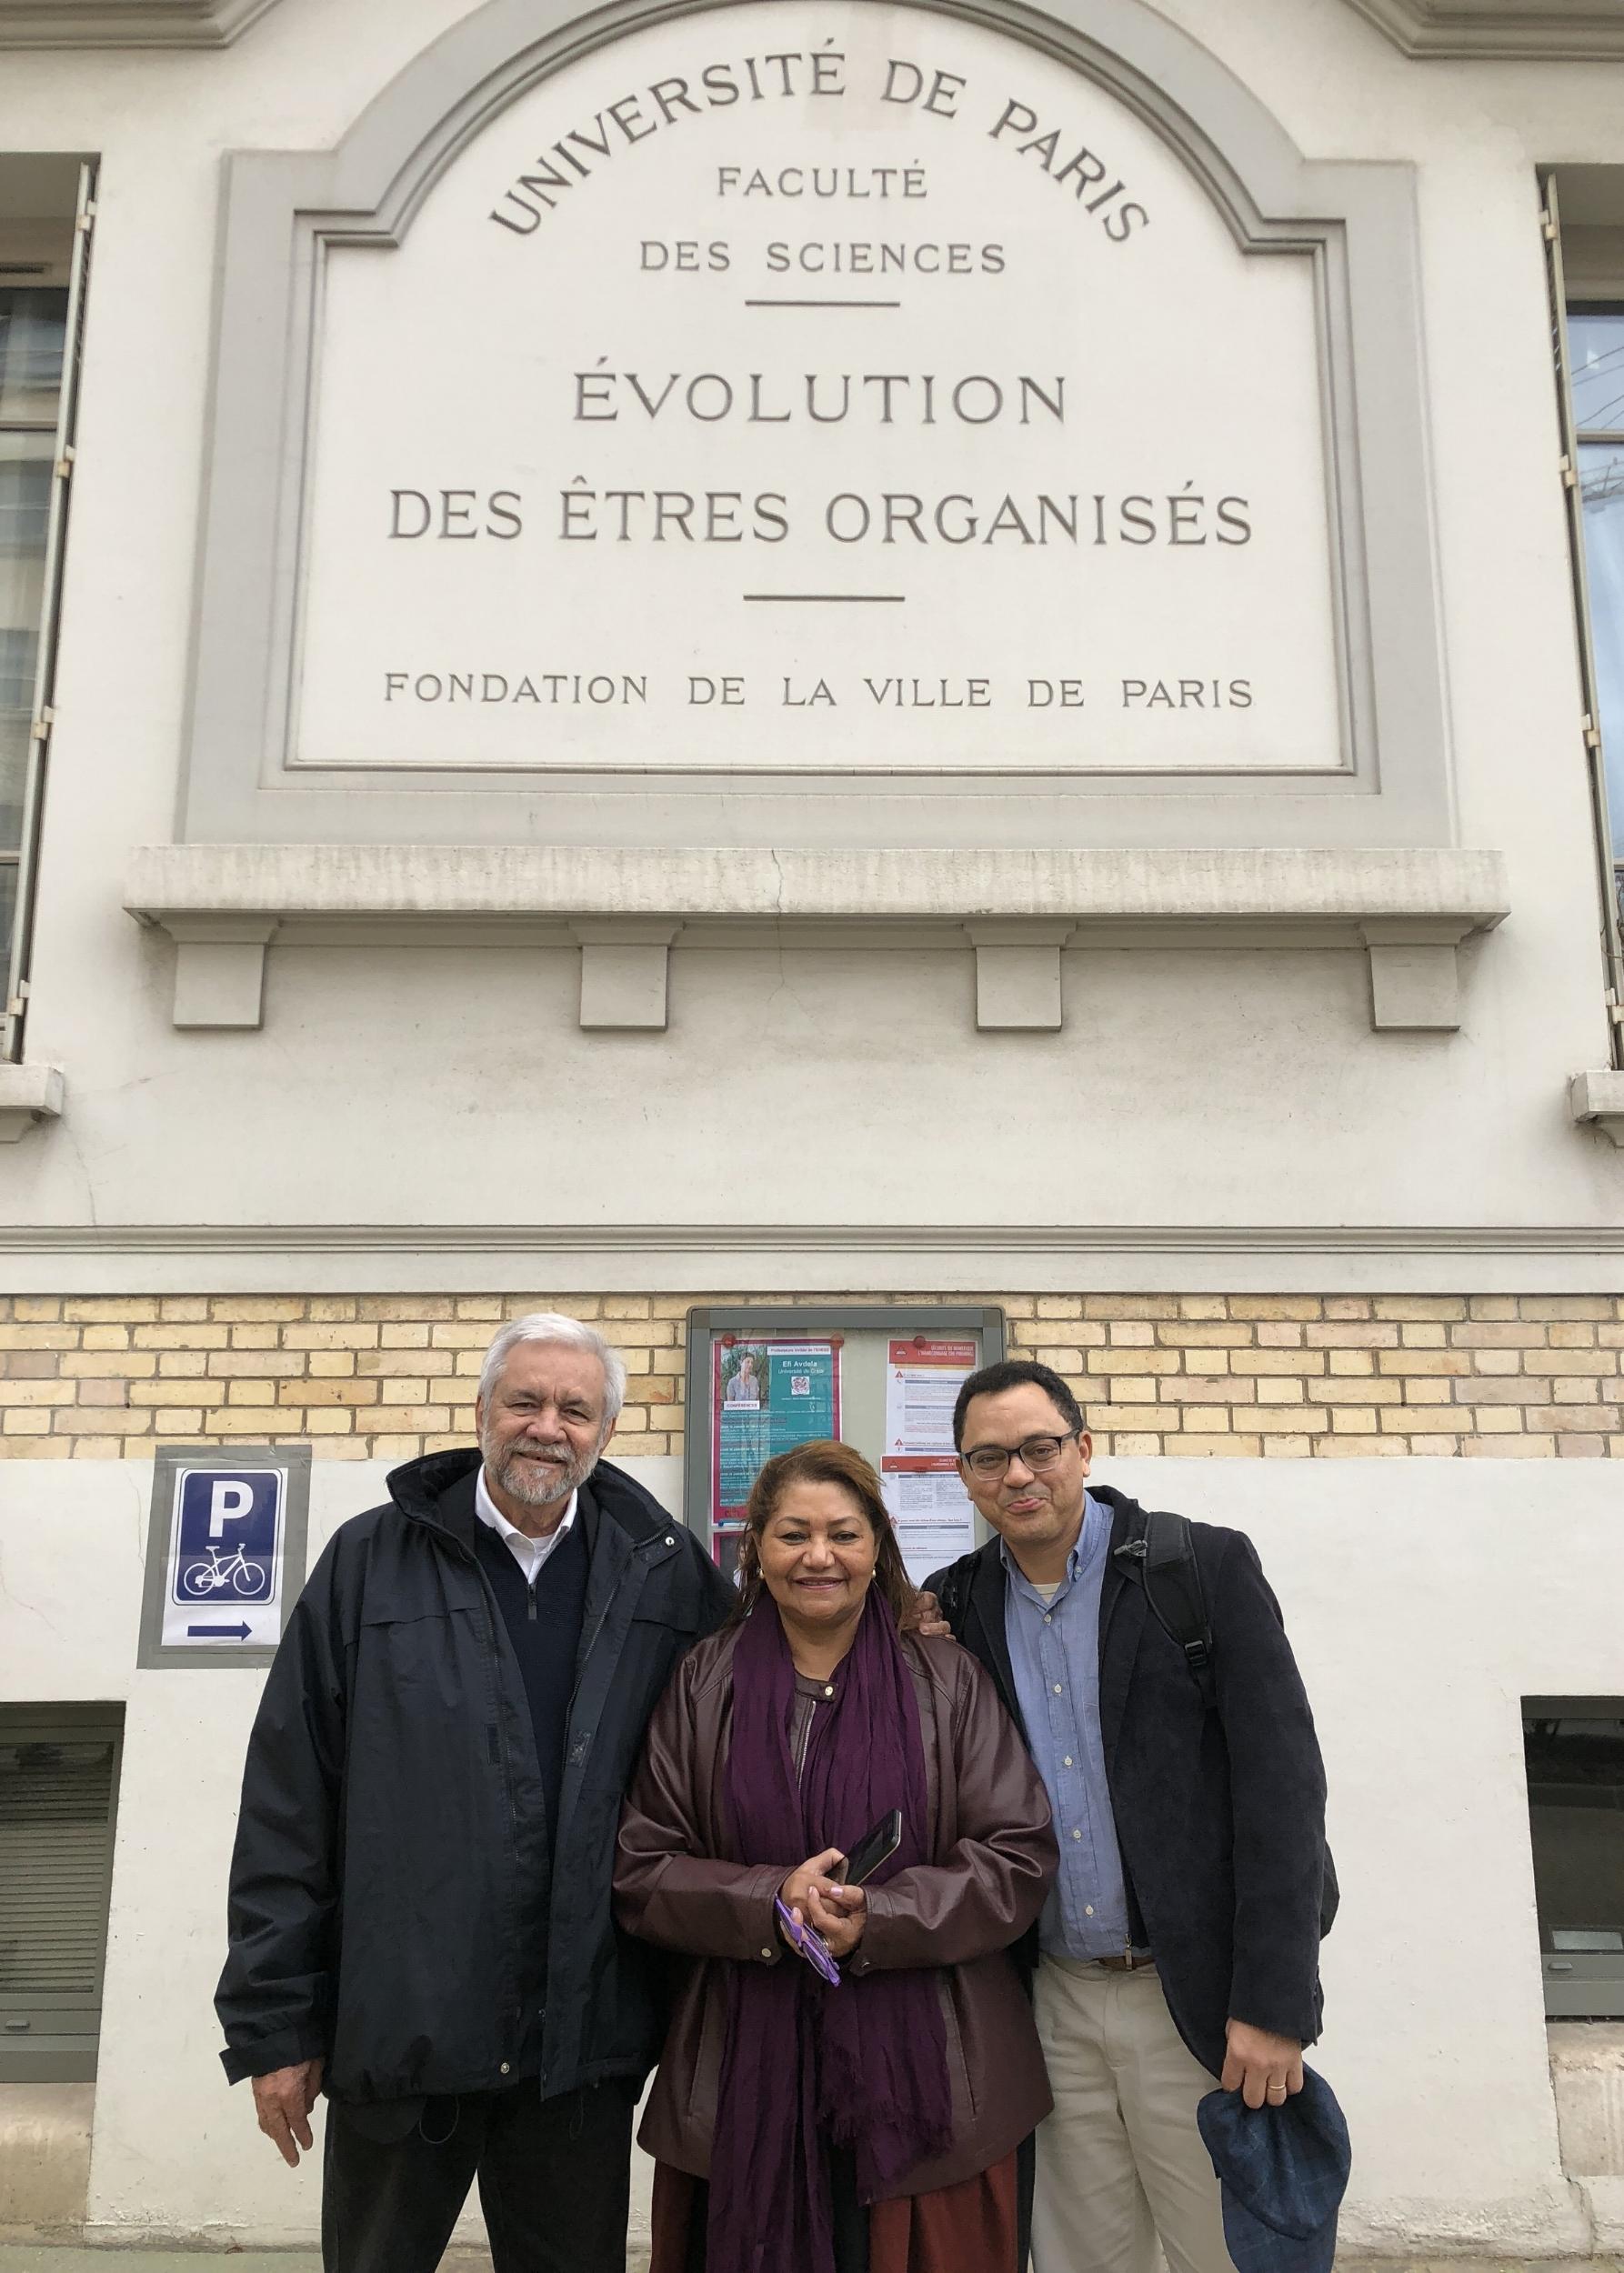 Marcus Barros,Marilene Corrêa and Marcos Colón in the event in Paris